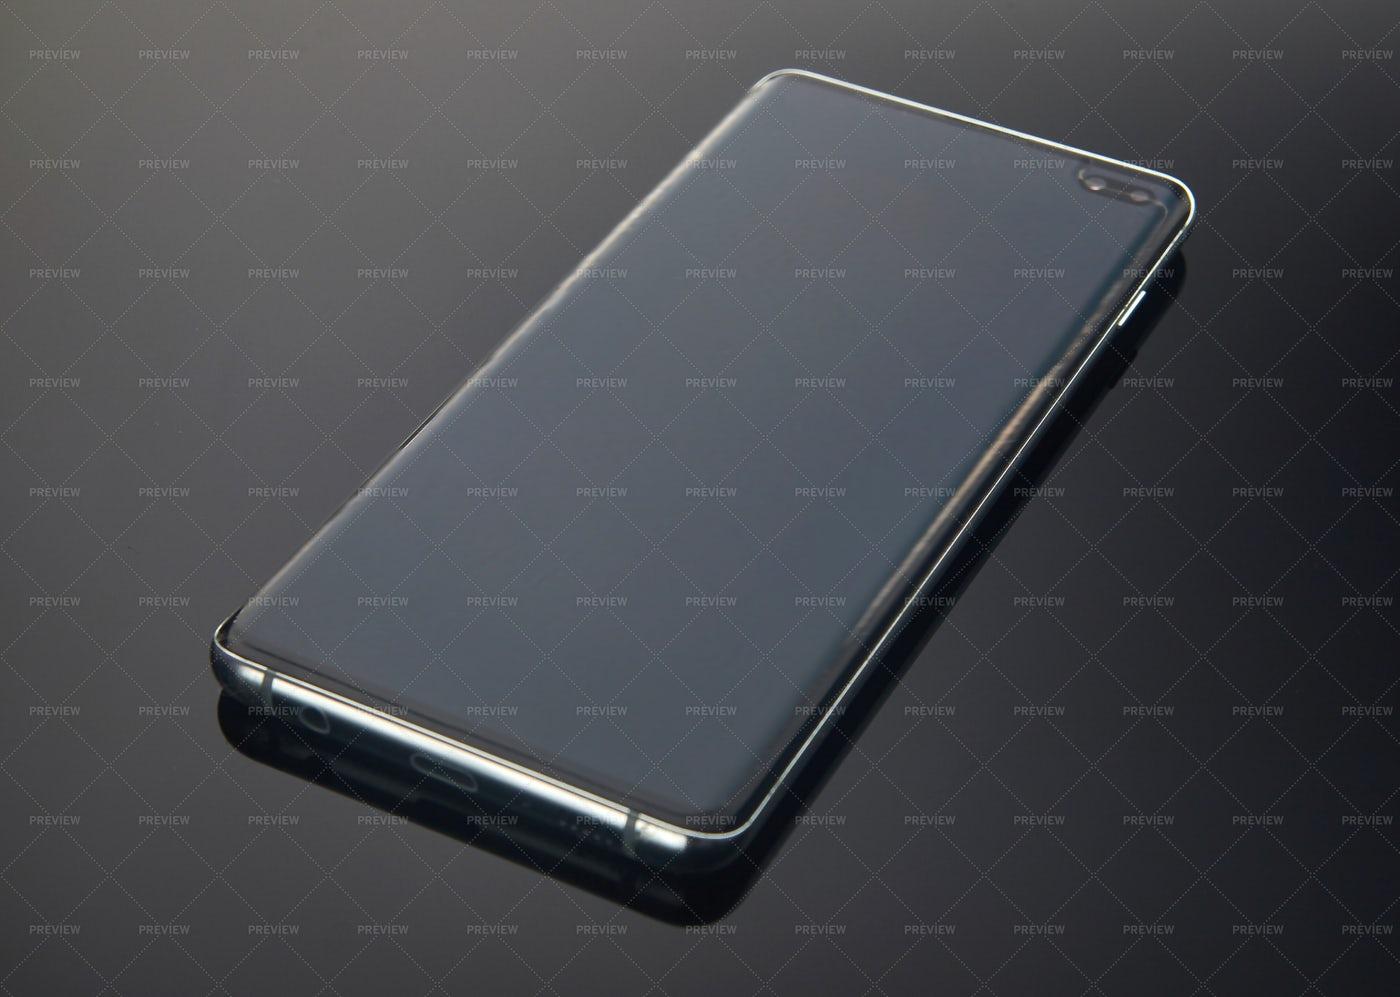 Smartphone On Dark Gradient Background: Stock Photos